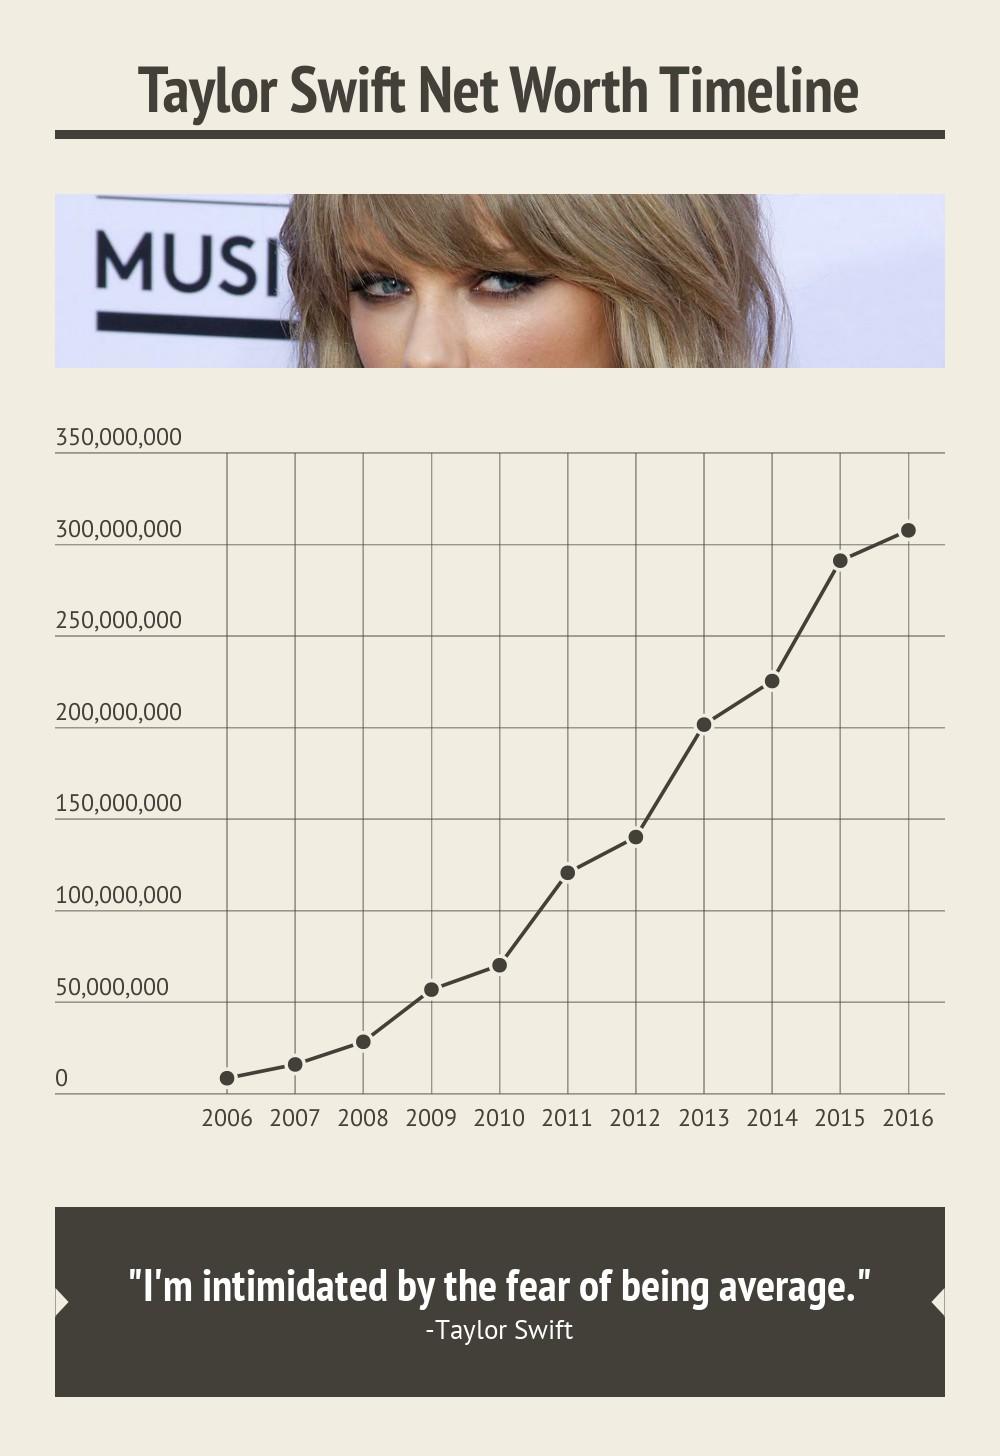 Taylor Swift Net Worth Timeline